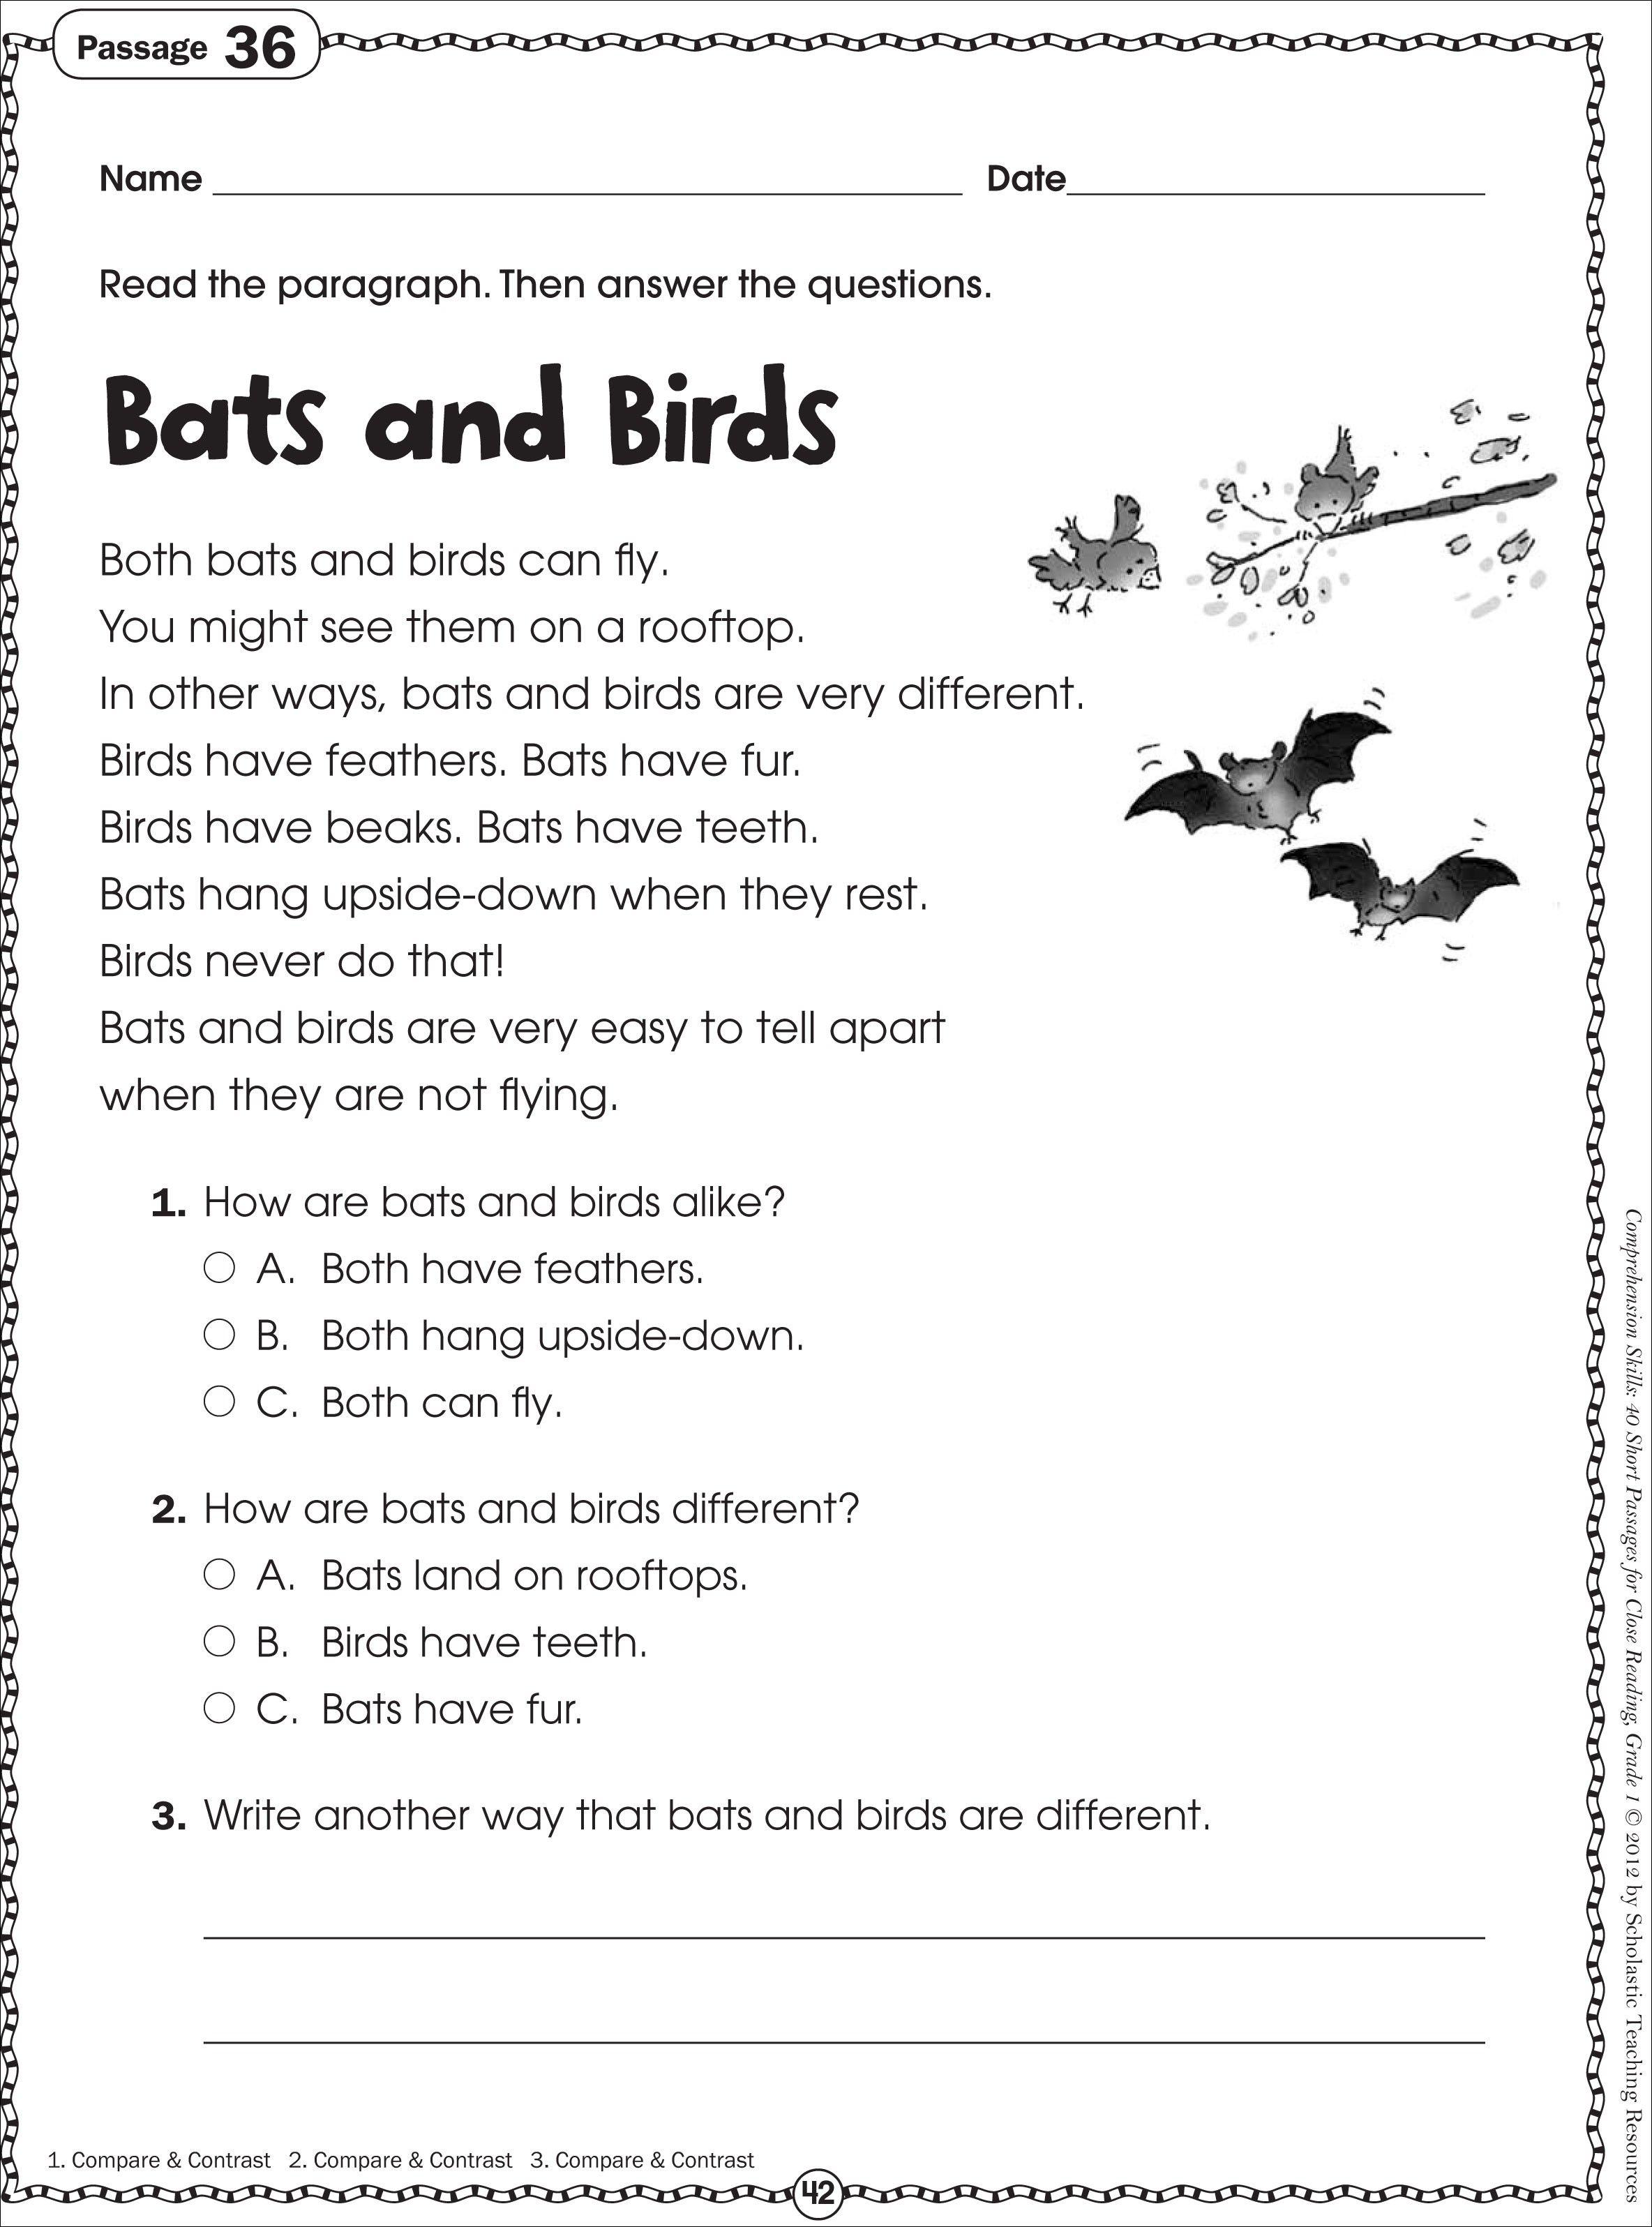 Free Printable Reading Comprehension Worksheets For Kindergarten - Free Printable Reading Comprehension Worksheets Grade 5